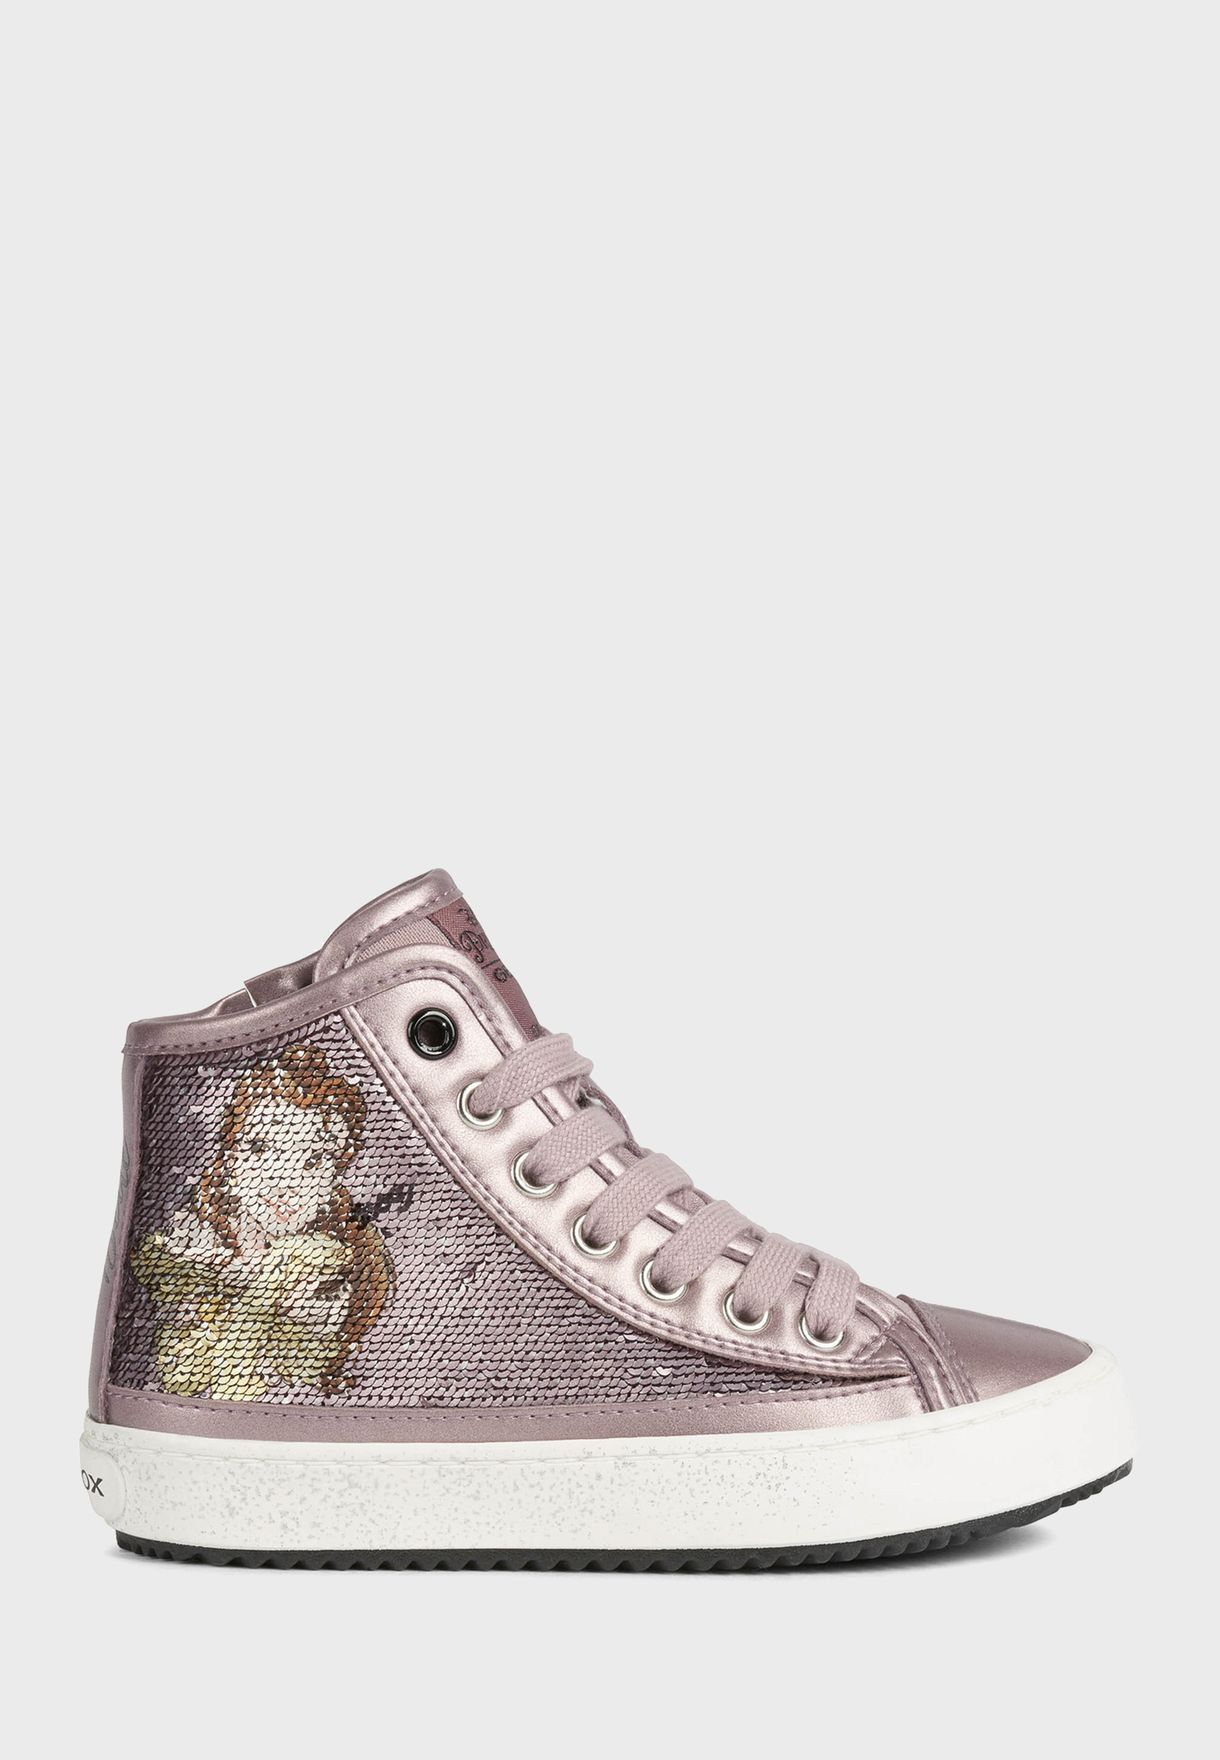 Kids Kalispera Lace Up High Top Sneaker